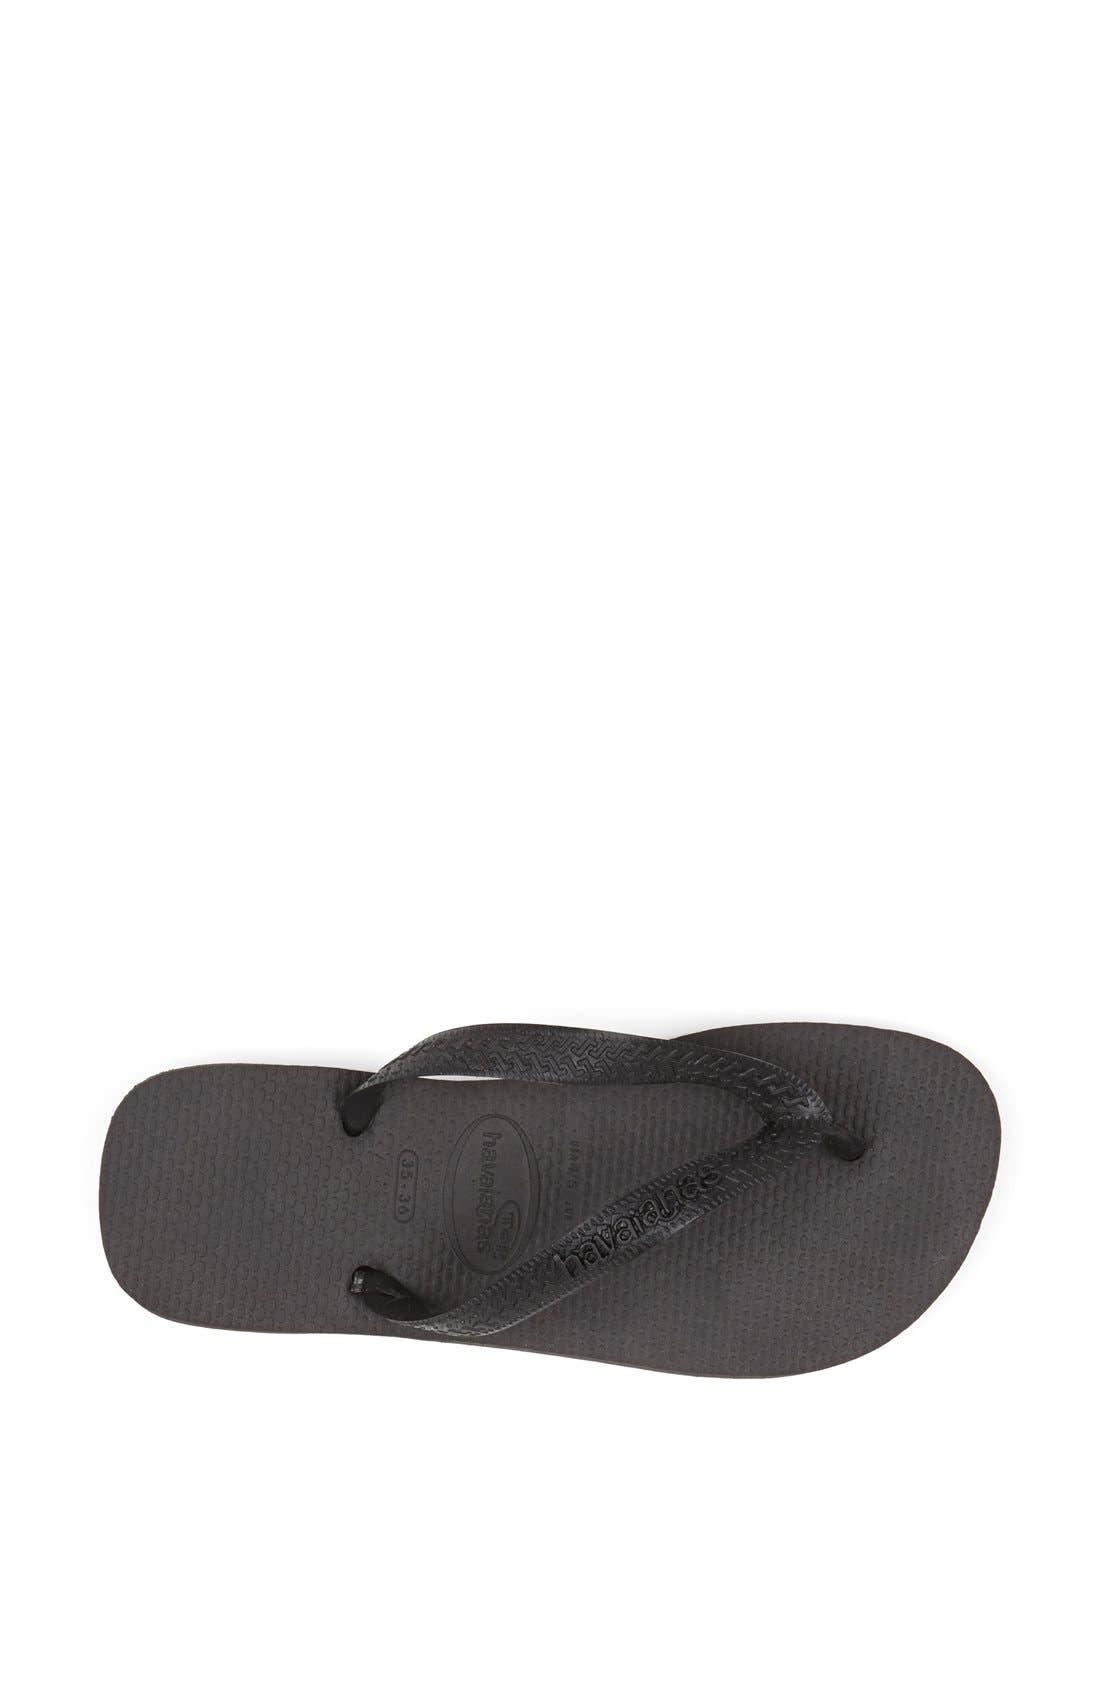 Alternate Image 4  - Havaianas 'Top' Sandal (Women)